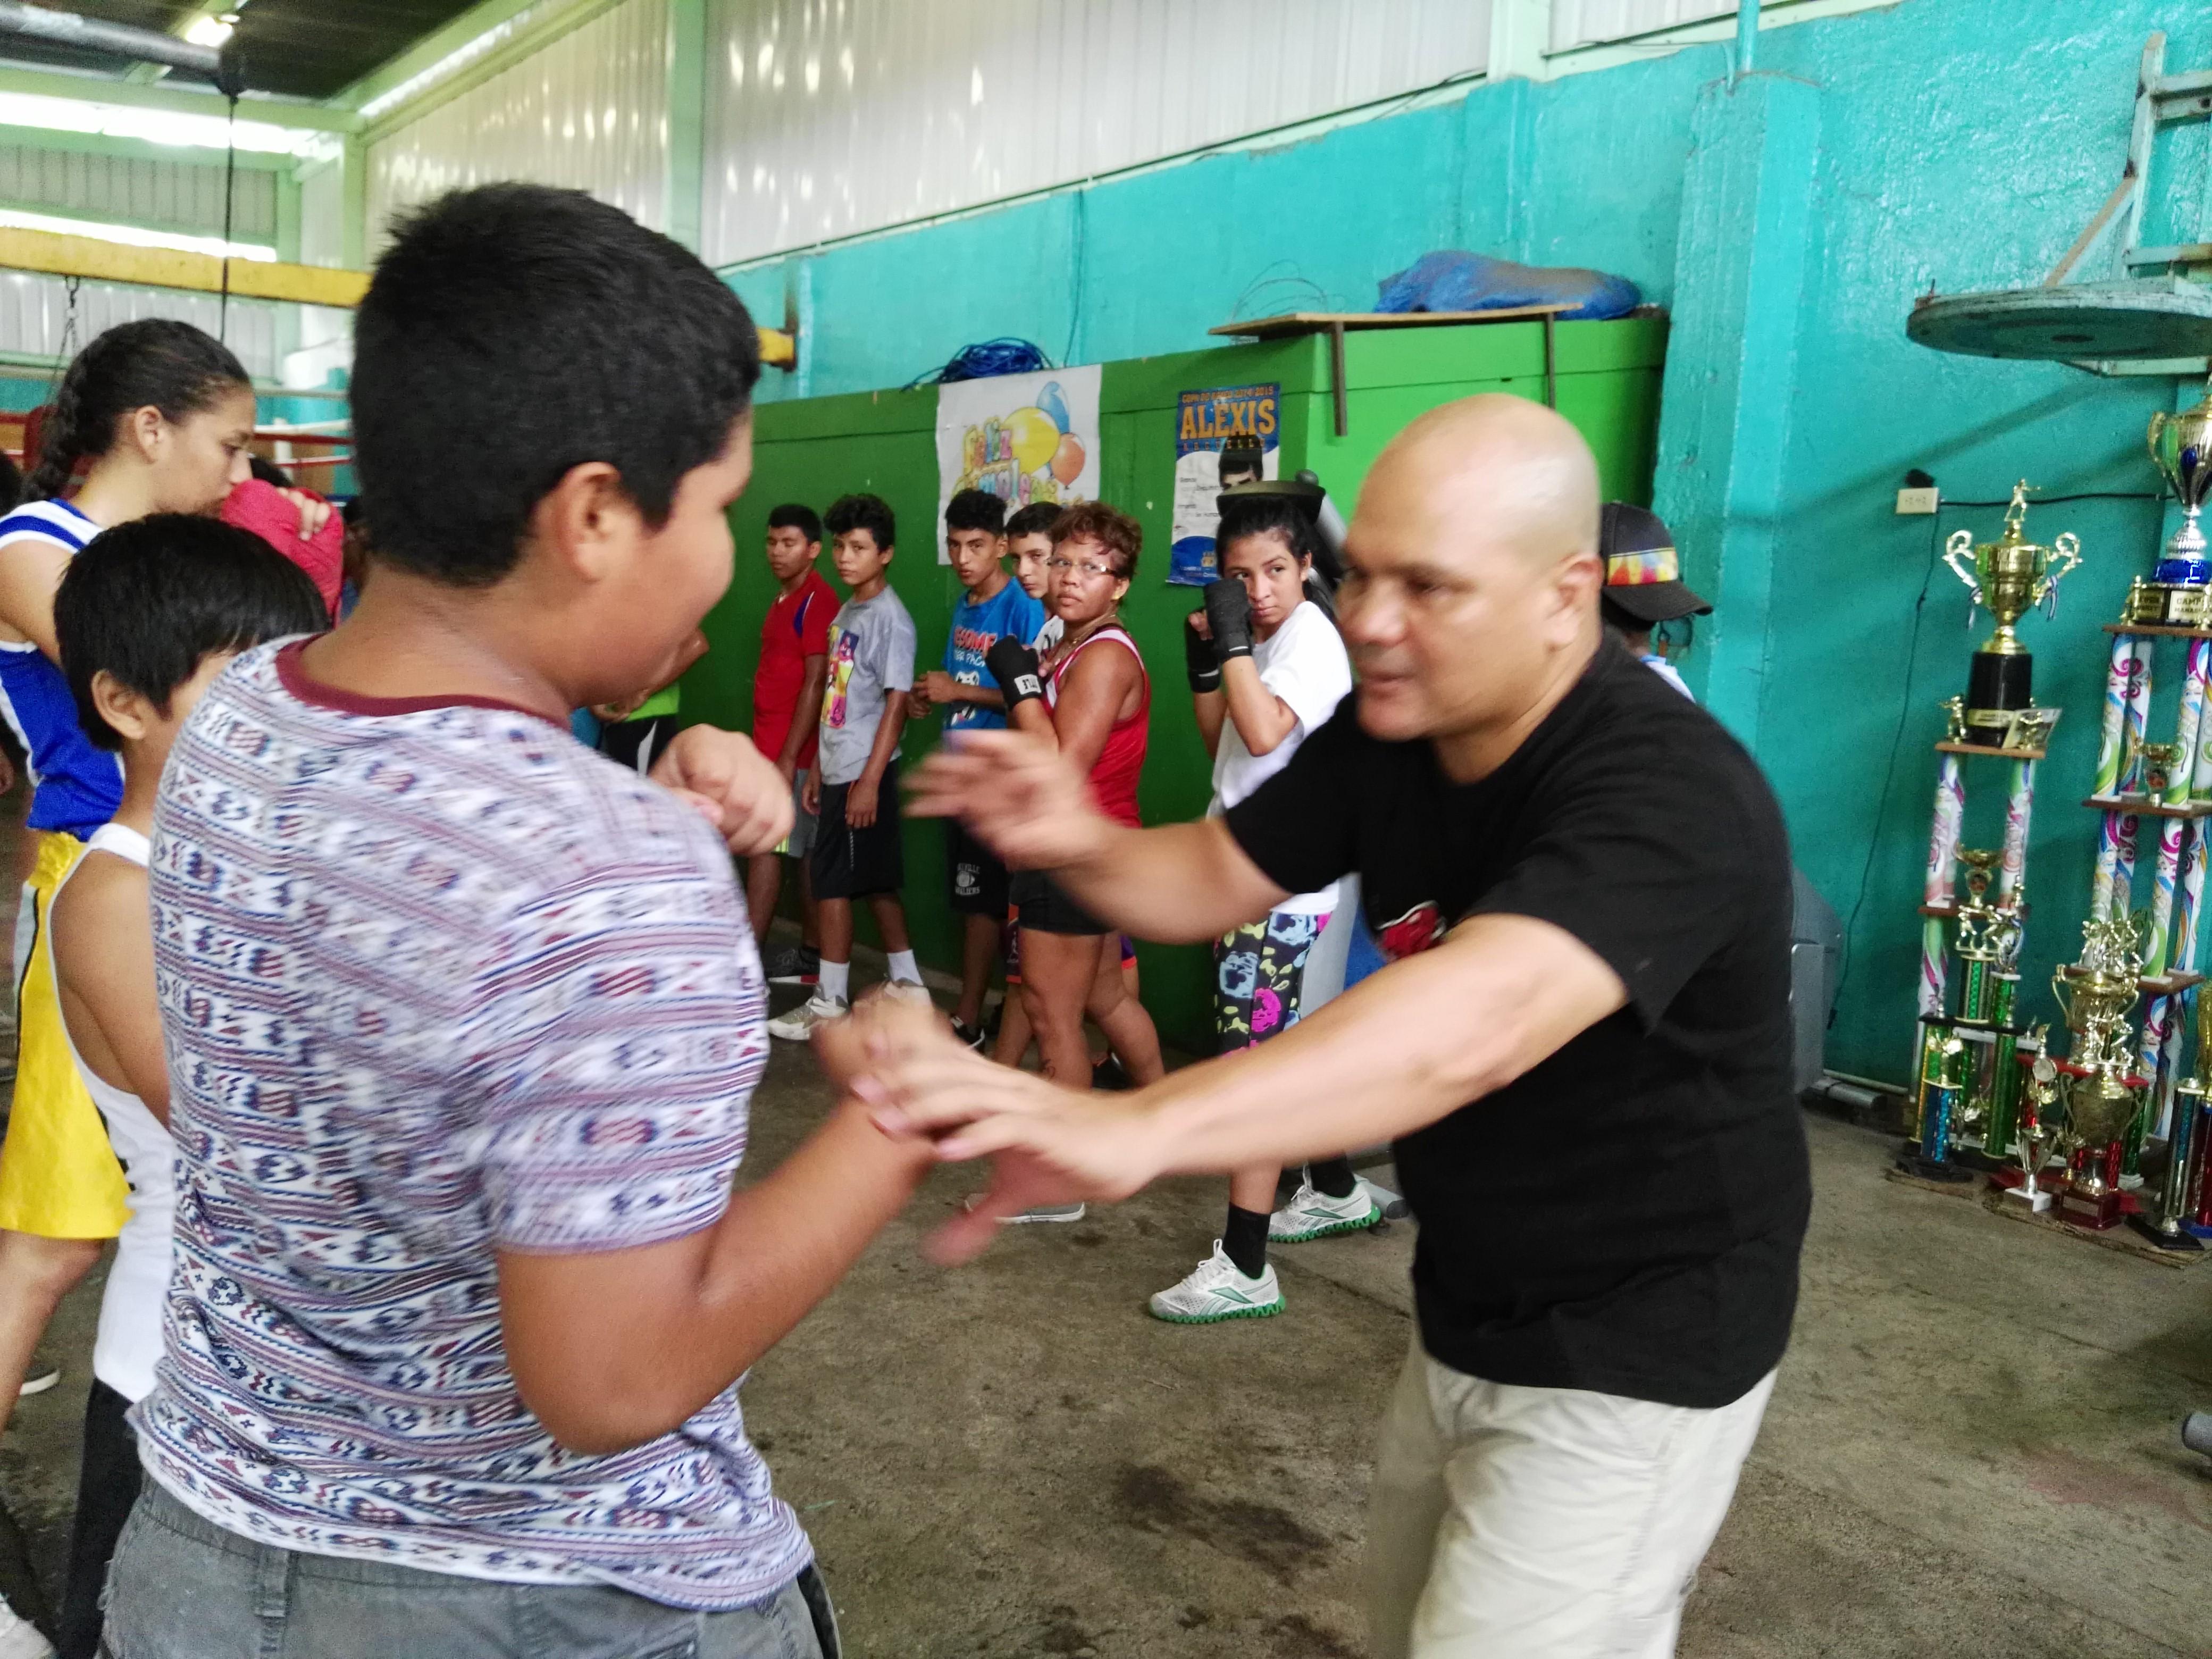 Rosendo Álvarez entrenó a un grupo de boxeadores jóvenes para que le fuera aprobada la licencia de entrenador. Foto: BAYRON SAAVEDRA